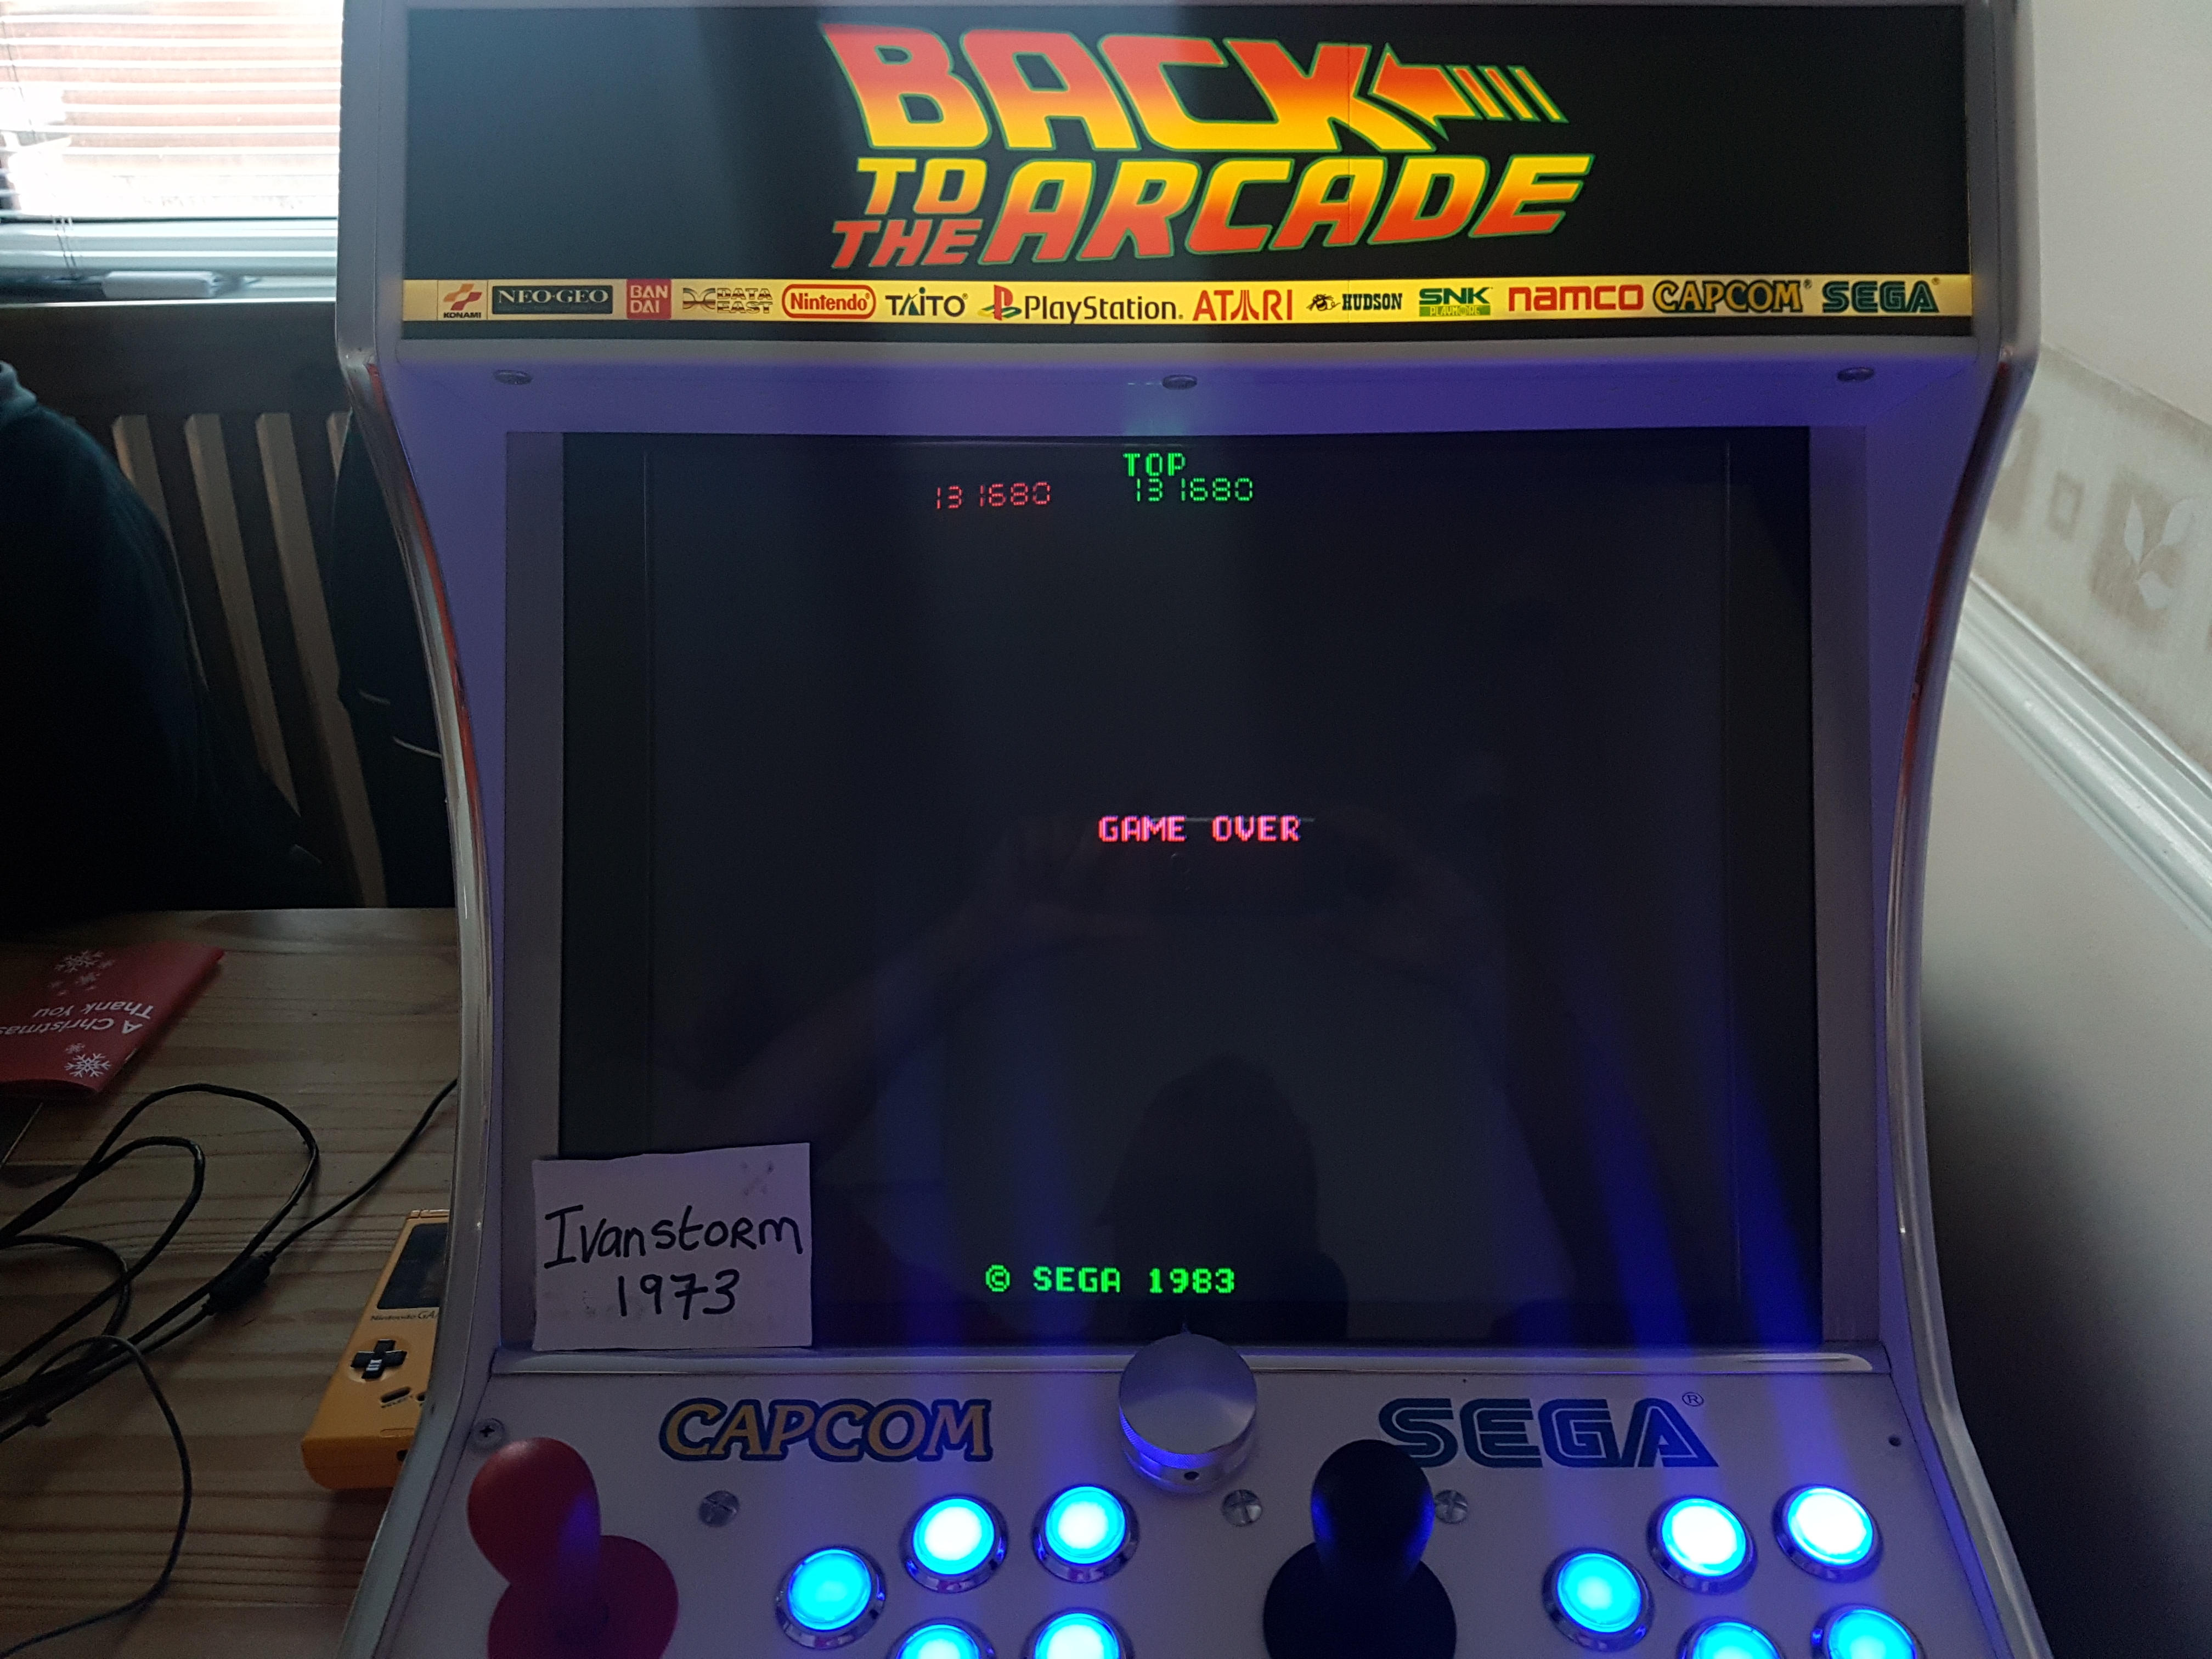 Ivanstorm1973: Hopper Robo [hopprobo] (Arcade Emulated / M.A.M.E.) 131,680 points on 2018-02-18 05:17:29